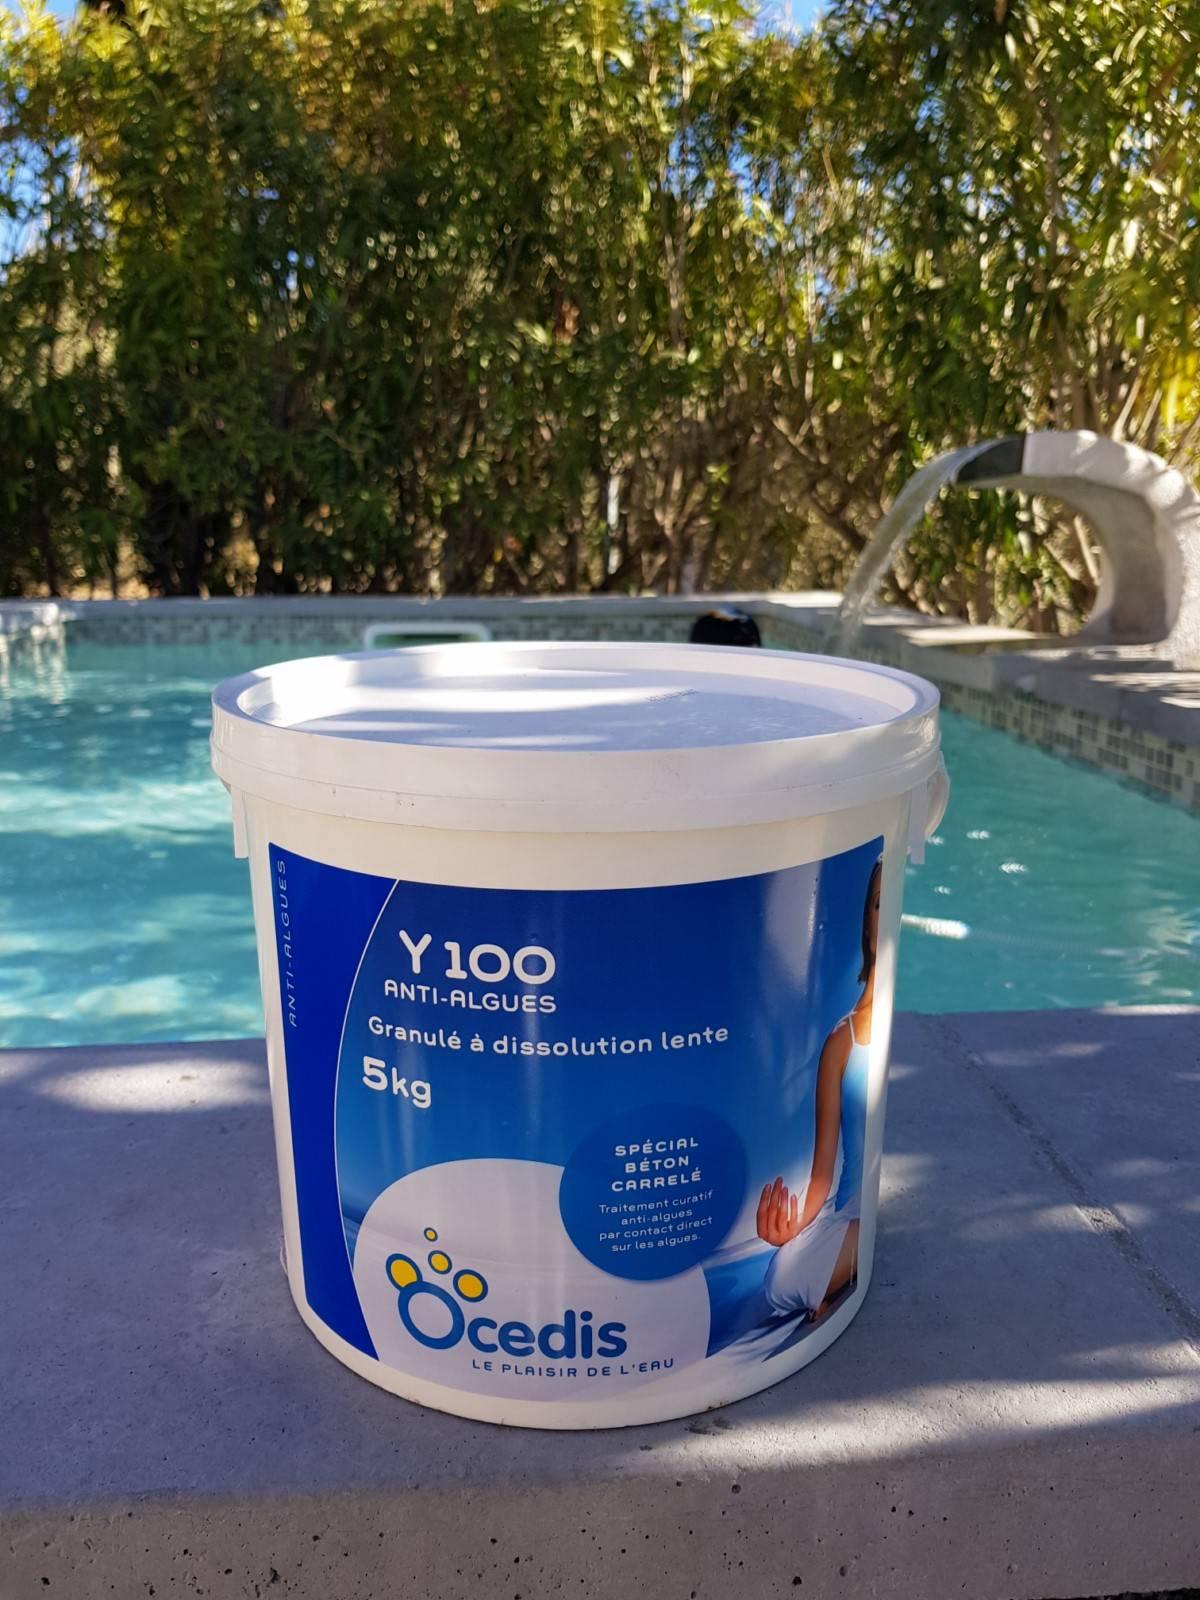 anti algues y100 Ferré piscines